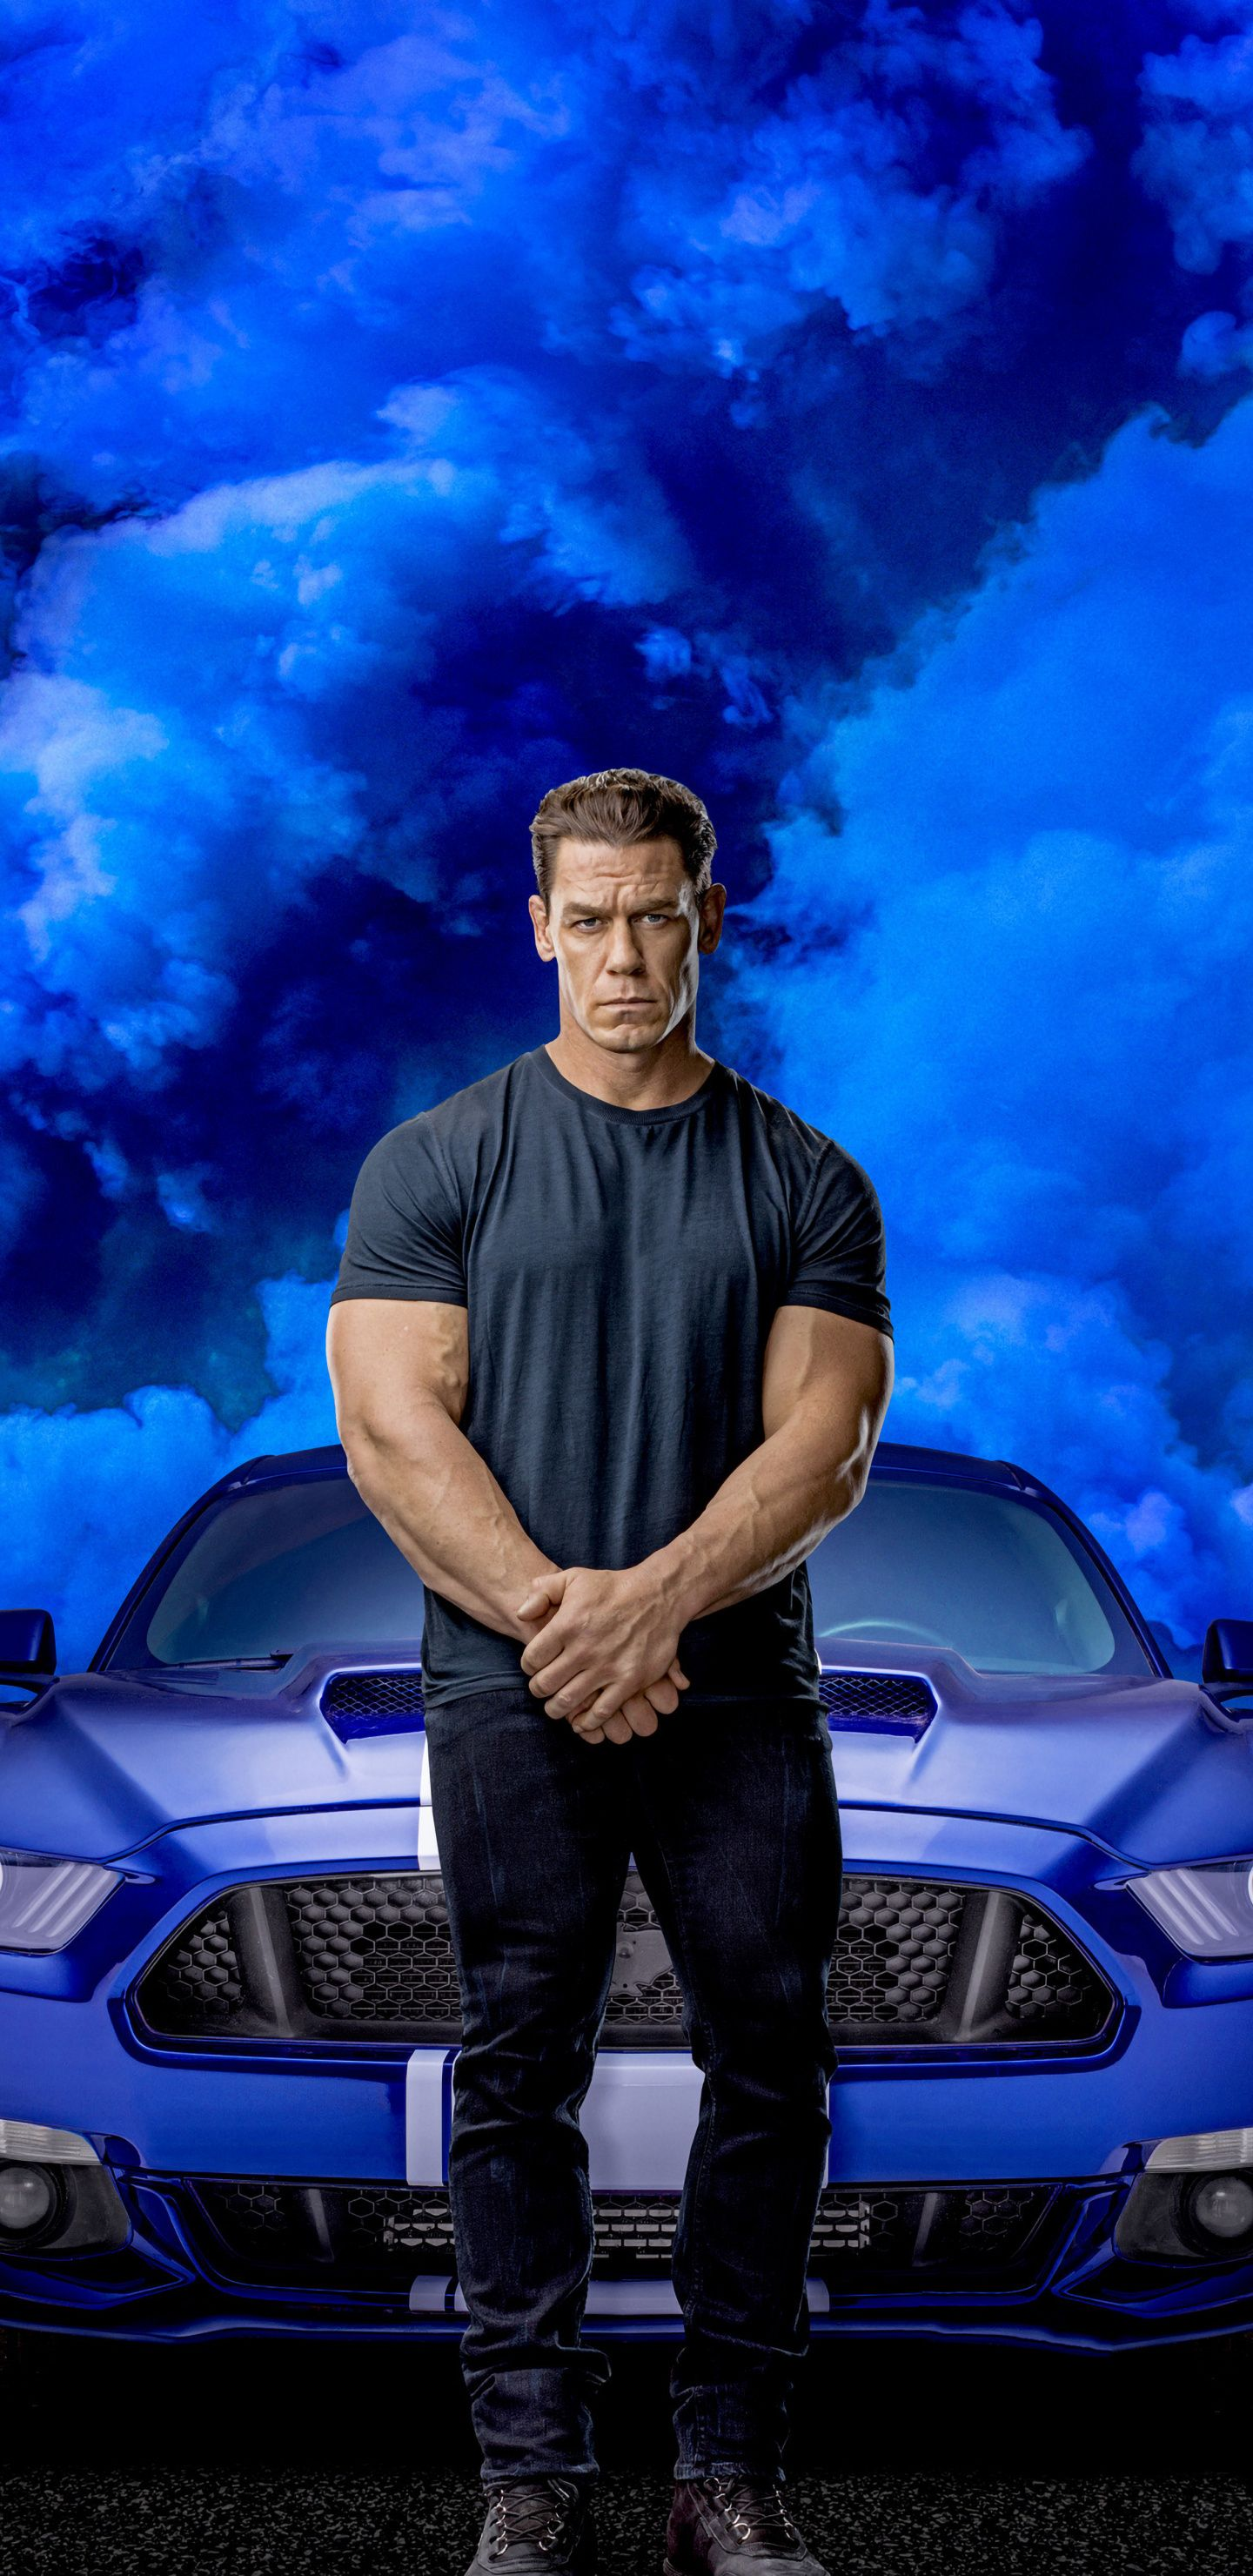 Download john cena fast furious 9 2020 movie wallpaper